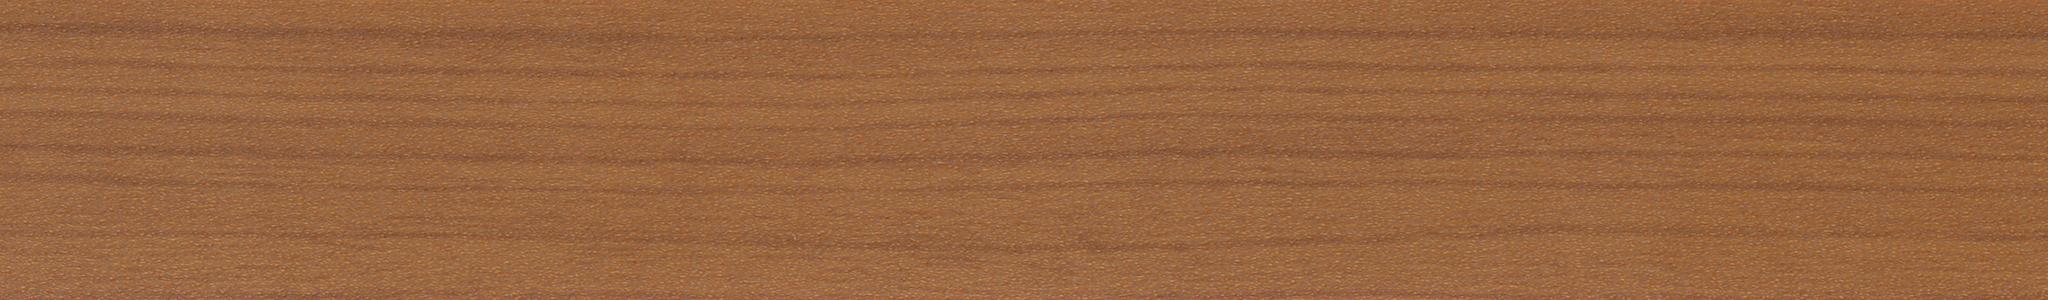 HD 221698 ABS hrana třešeň perla